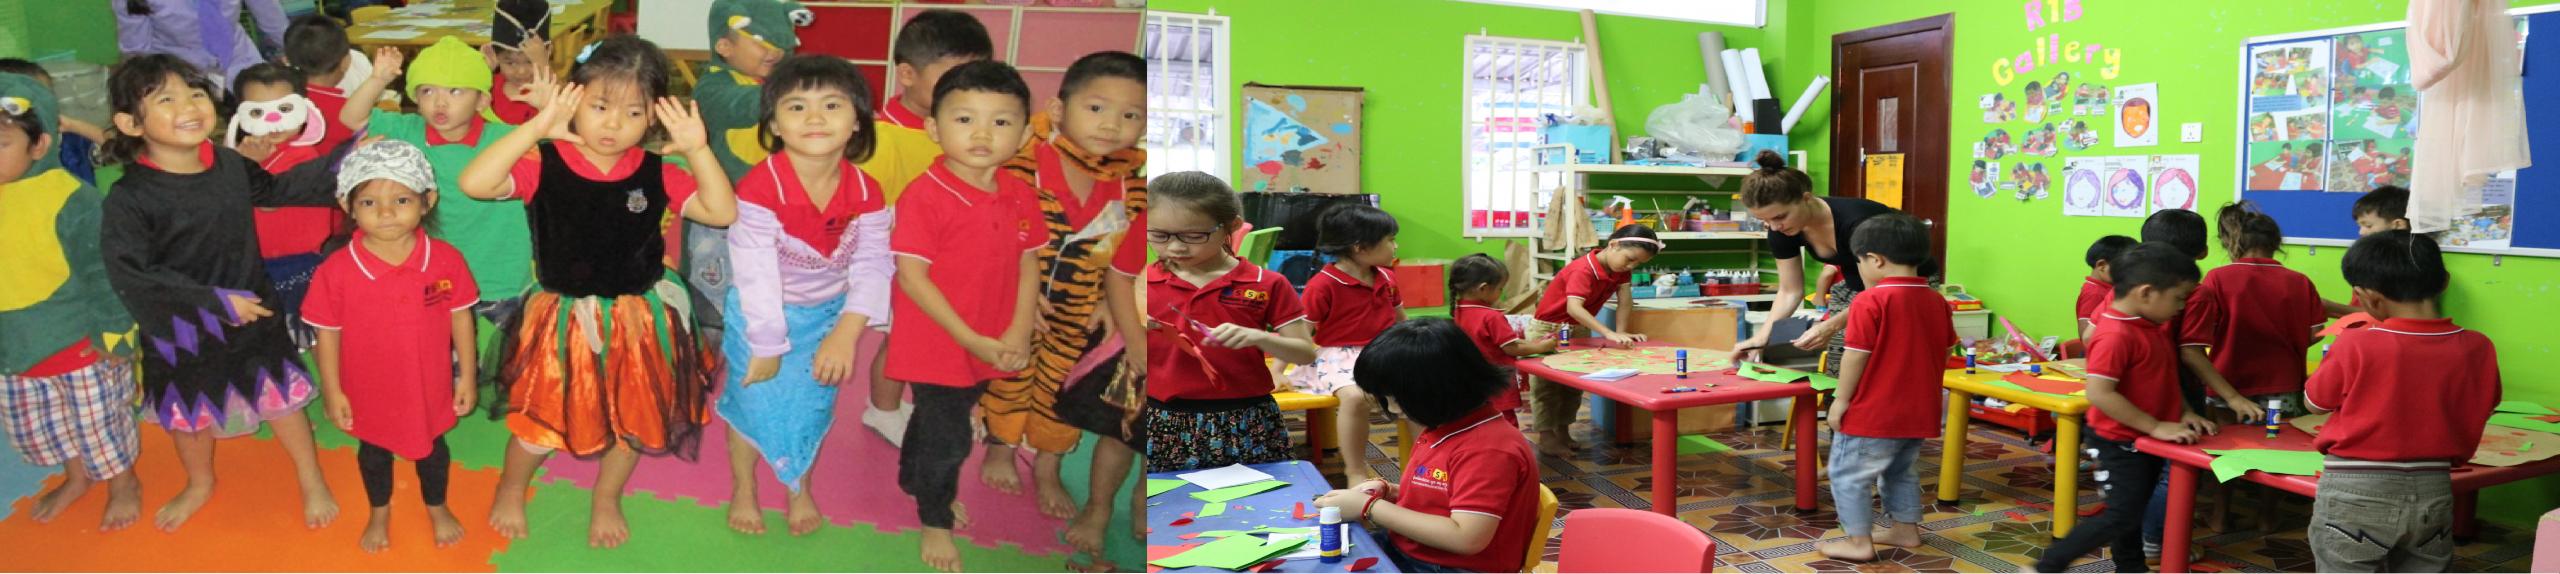 12  International School Of Siem Reap  Issr intended for Issr School Calendar